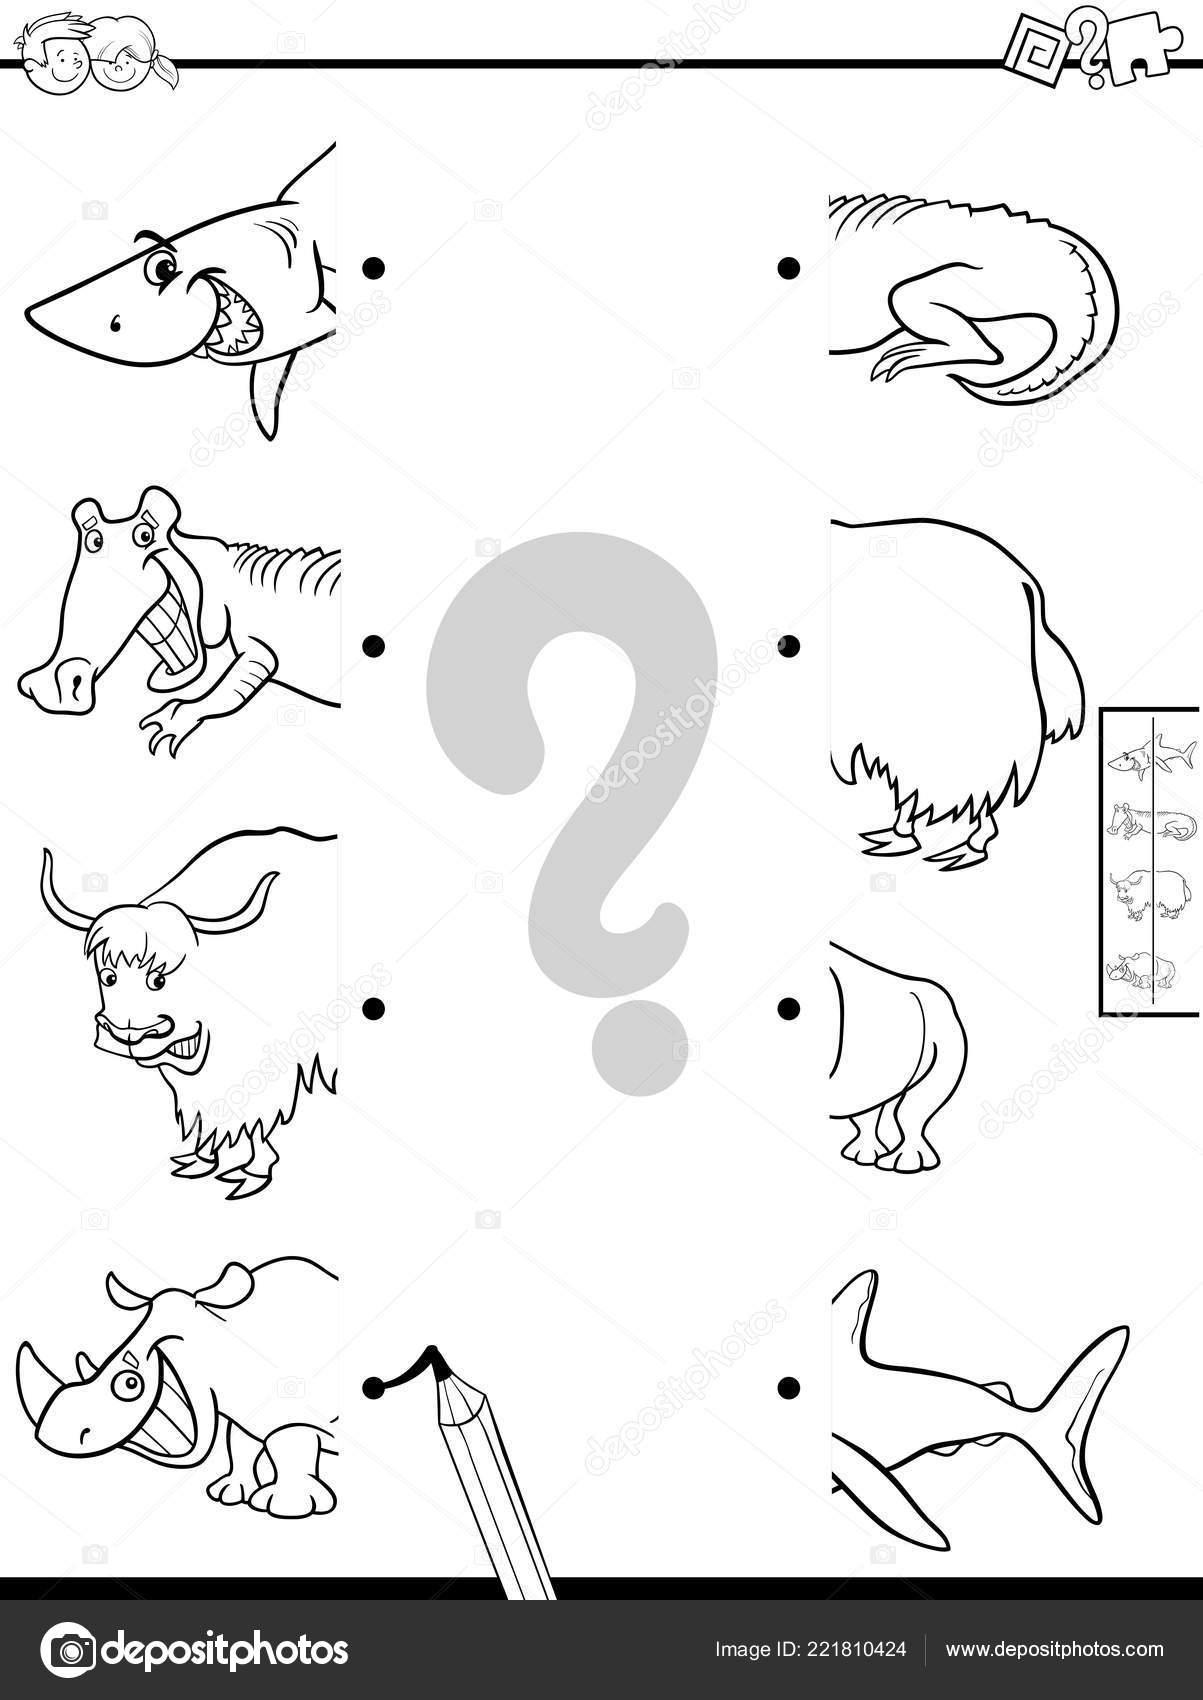 Black White Cartoon Illustration Educational Game Matching Halves